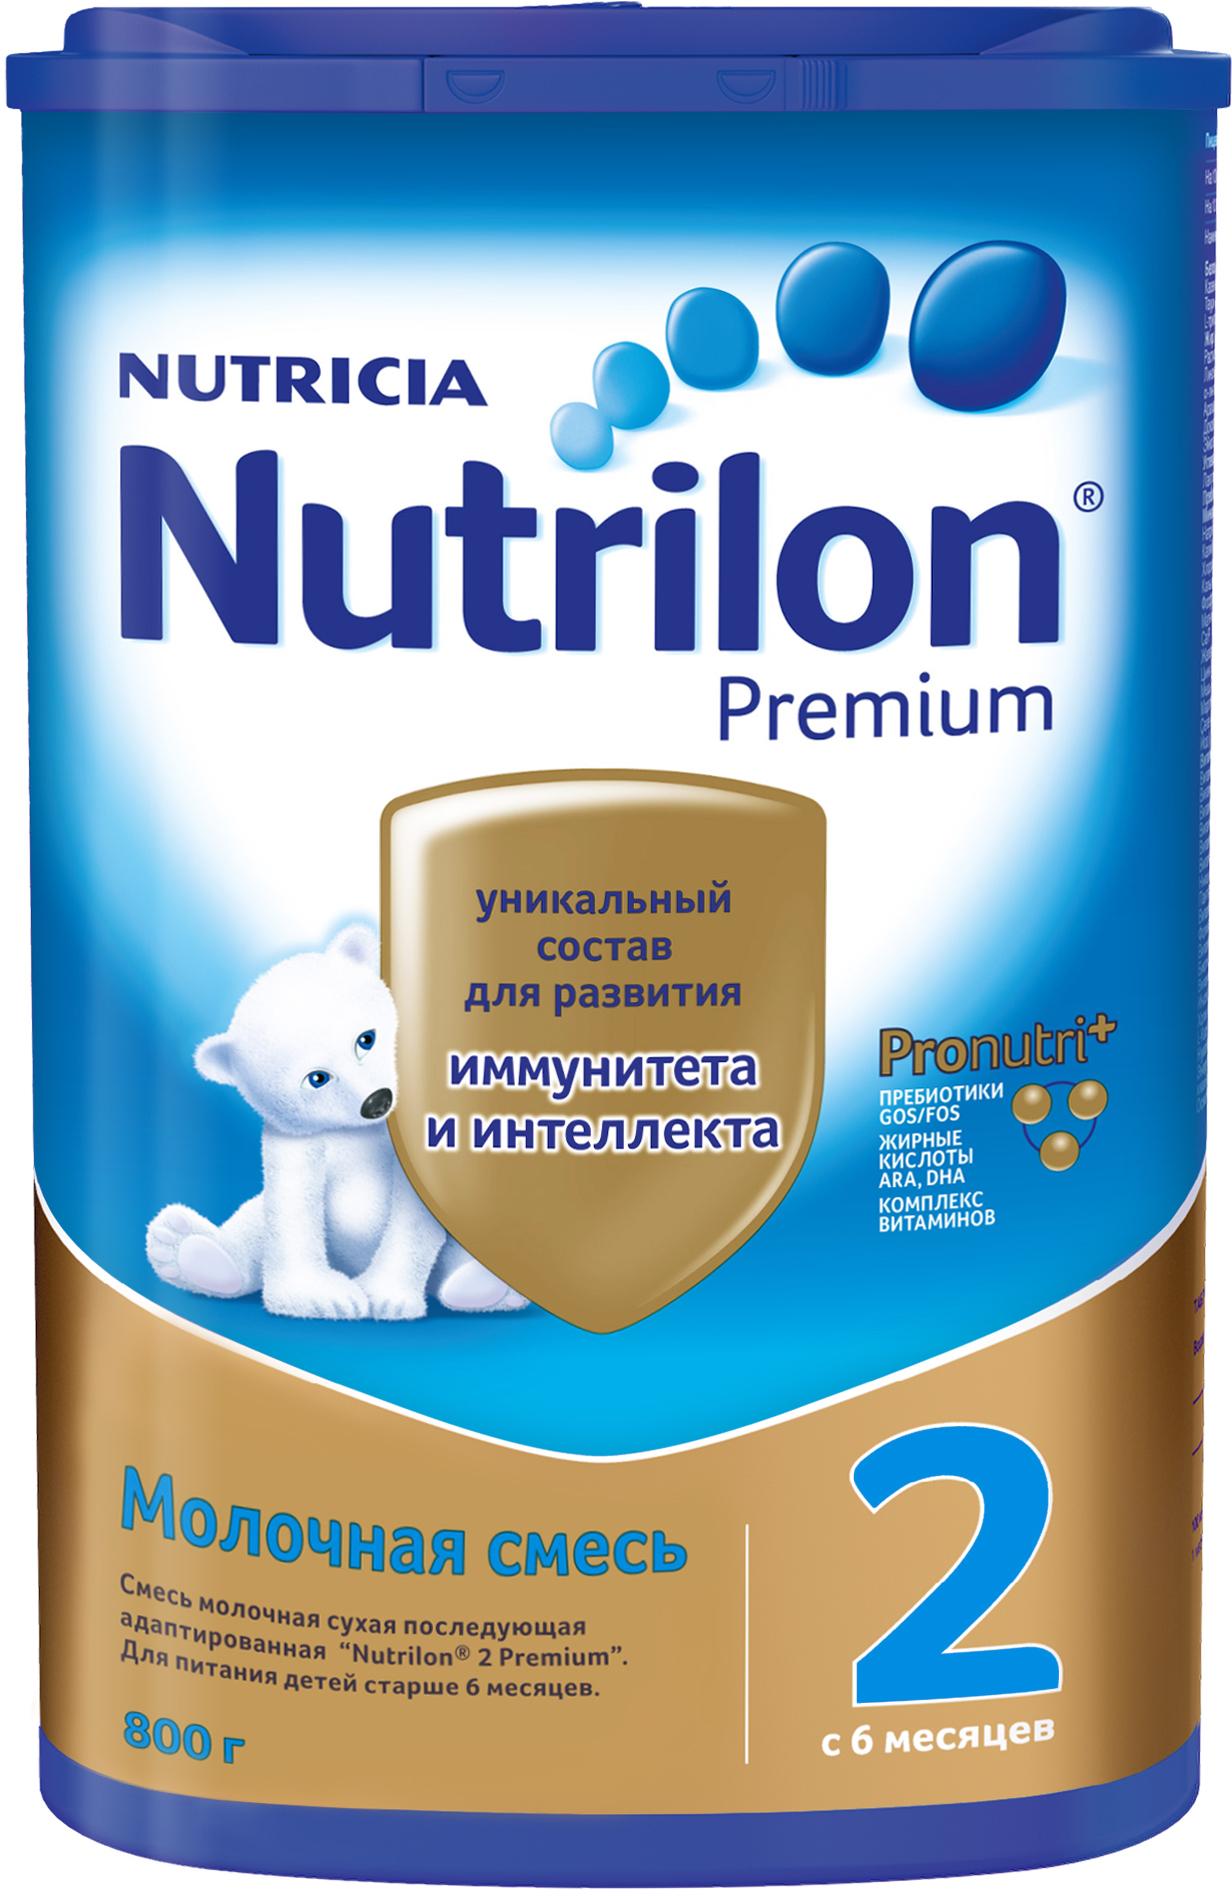 Молочная смесь Nutricia Nutrilon (Nutricia) 2 Premium (c 6 месяцев) 800 г молочная смесь nutricia nutrilon nutricia 2 premium c 6 месяцев 800 г